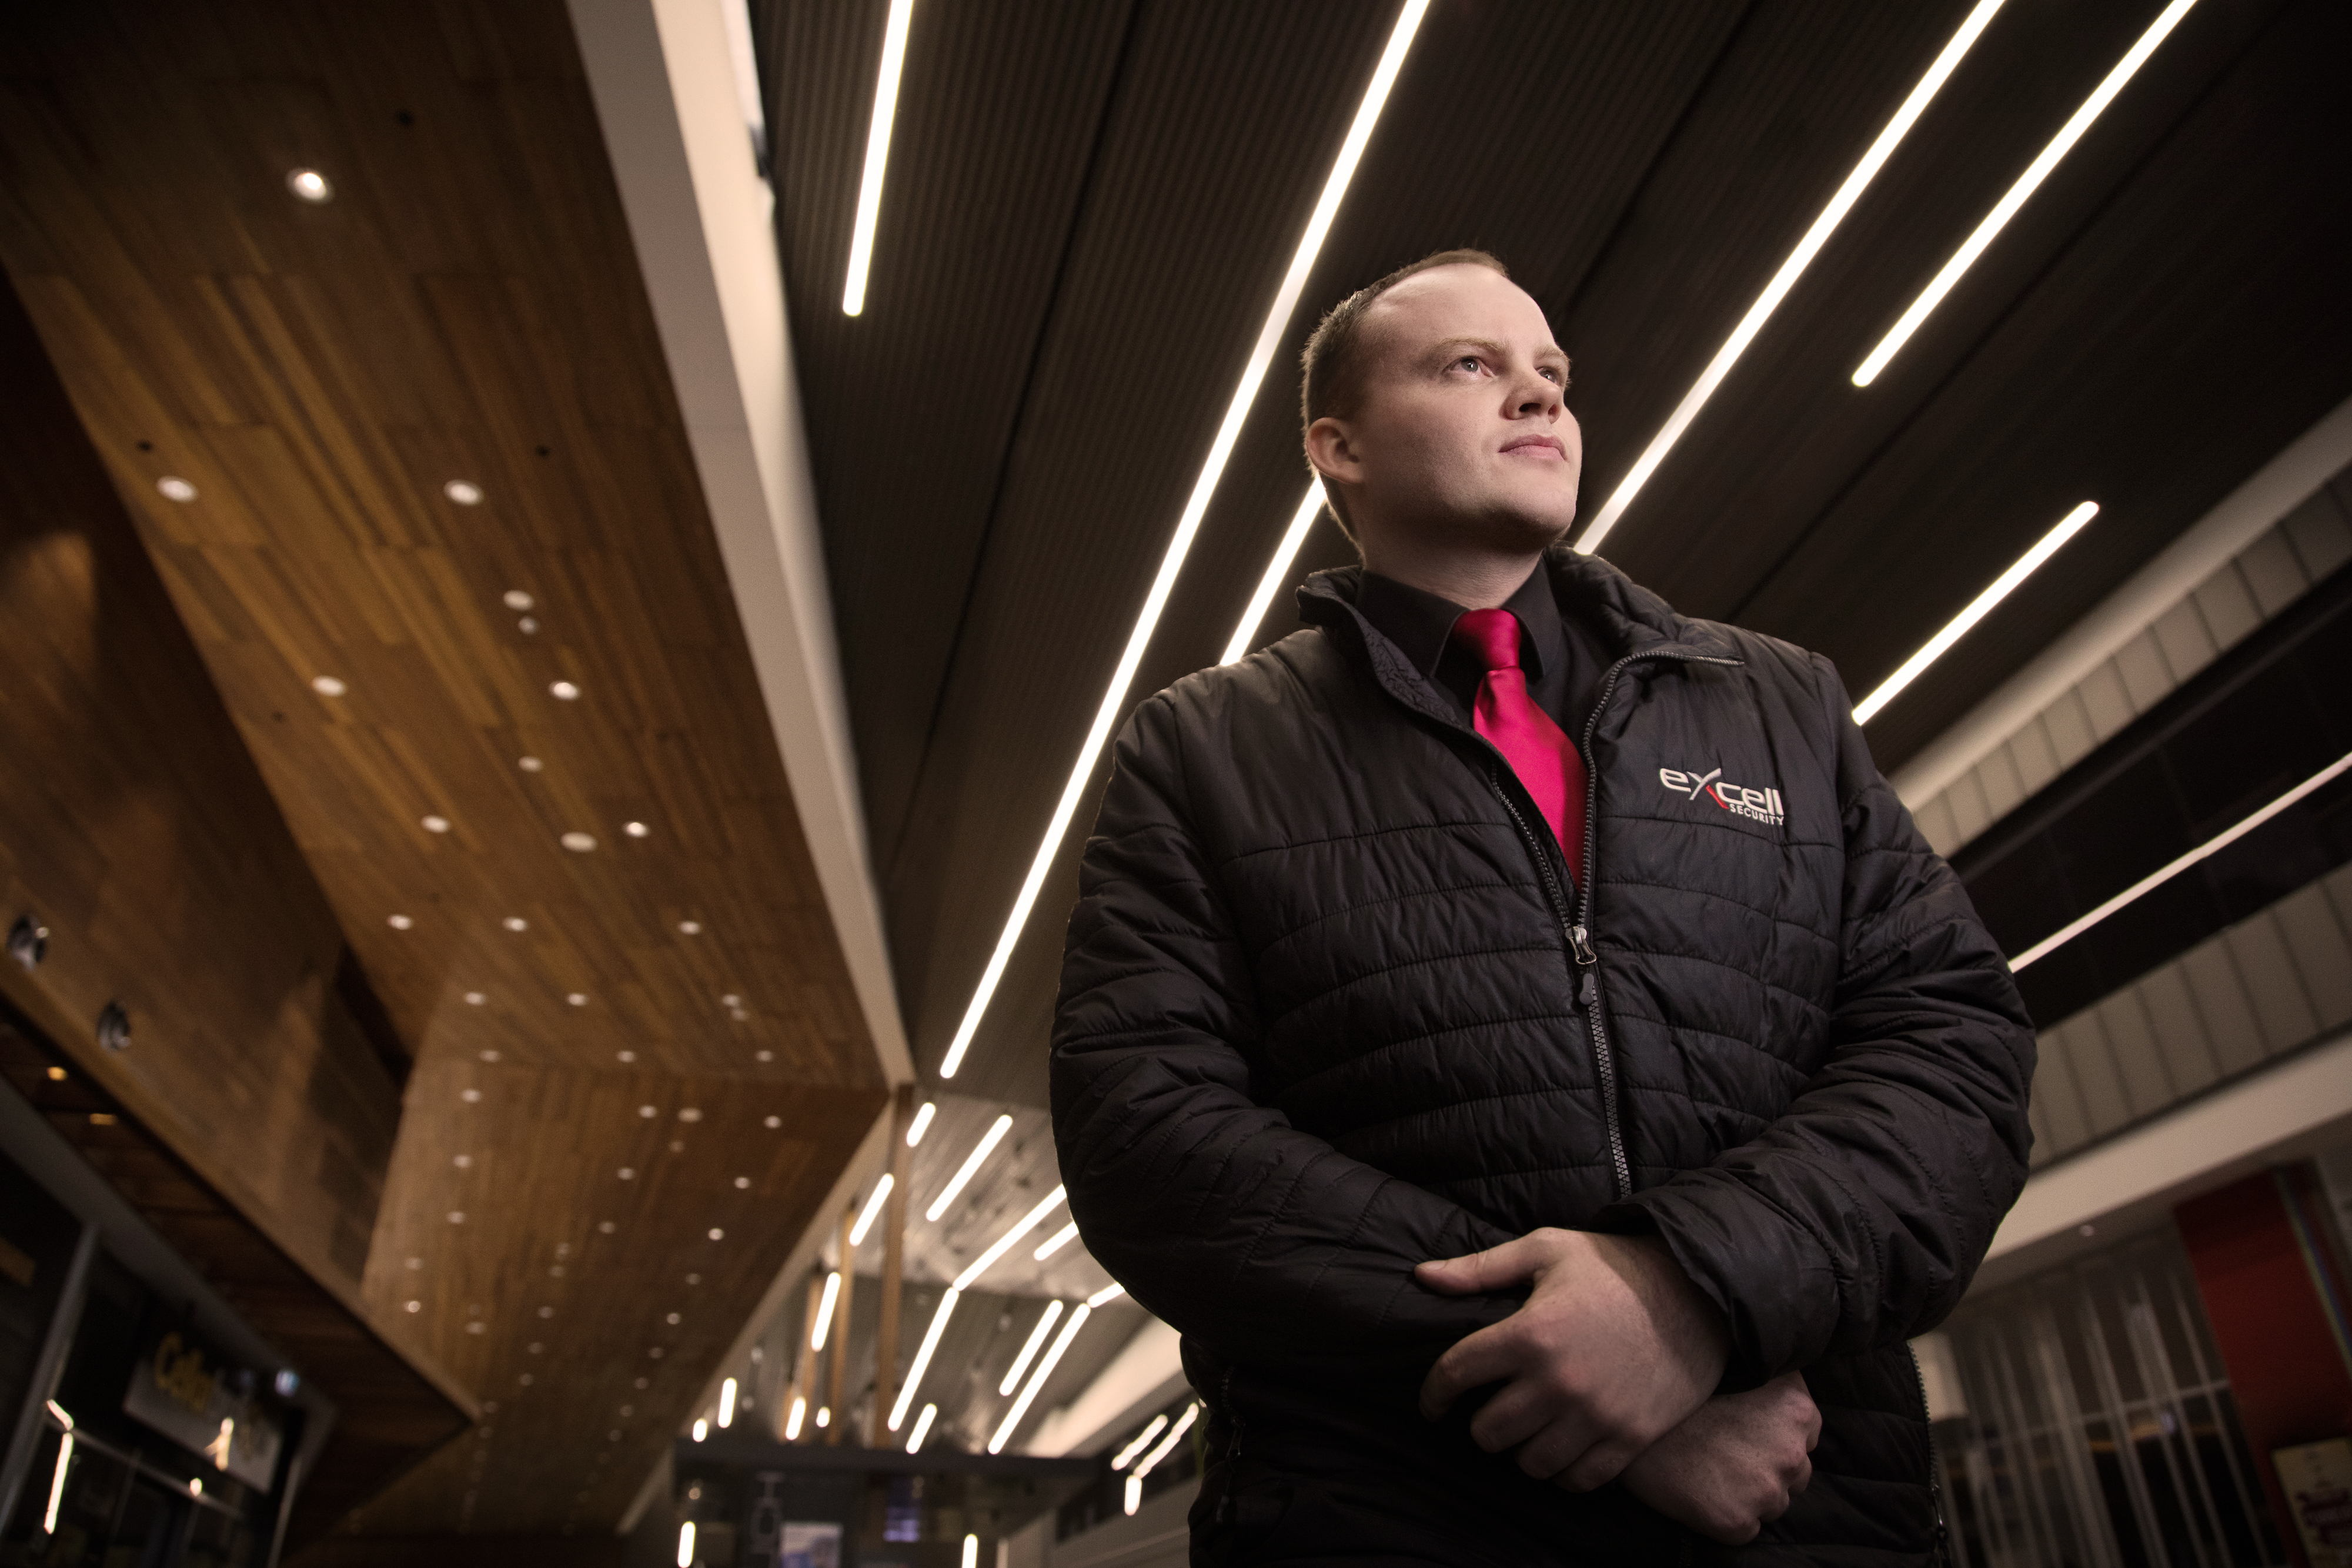 Male guard inside building